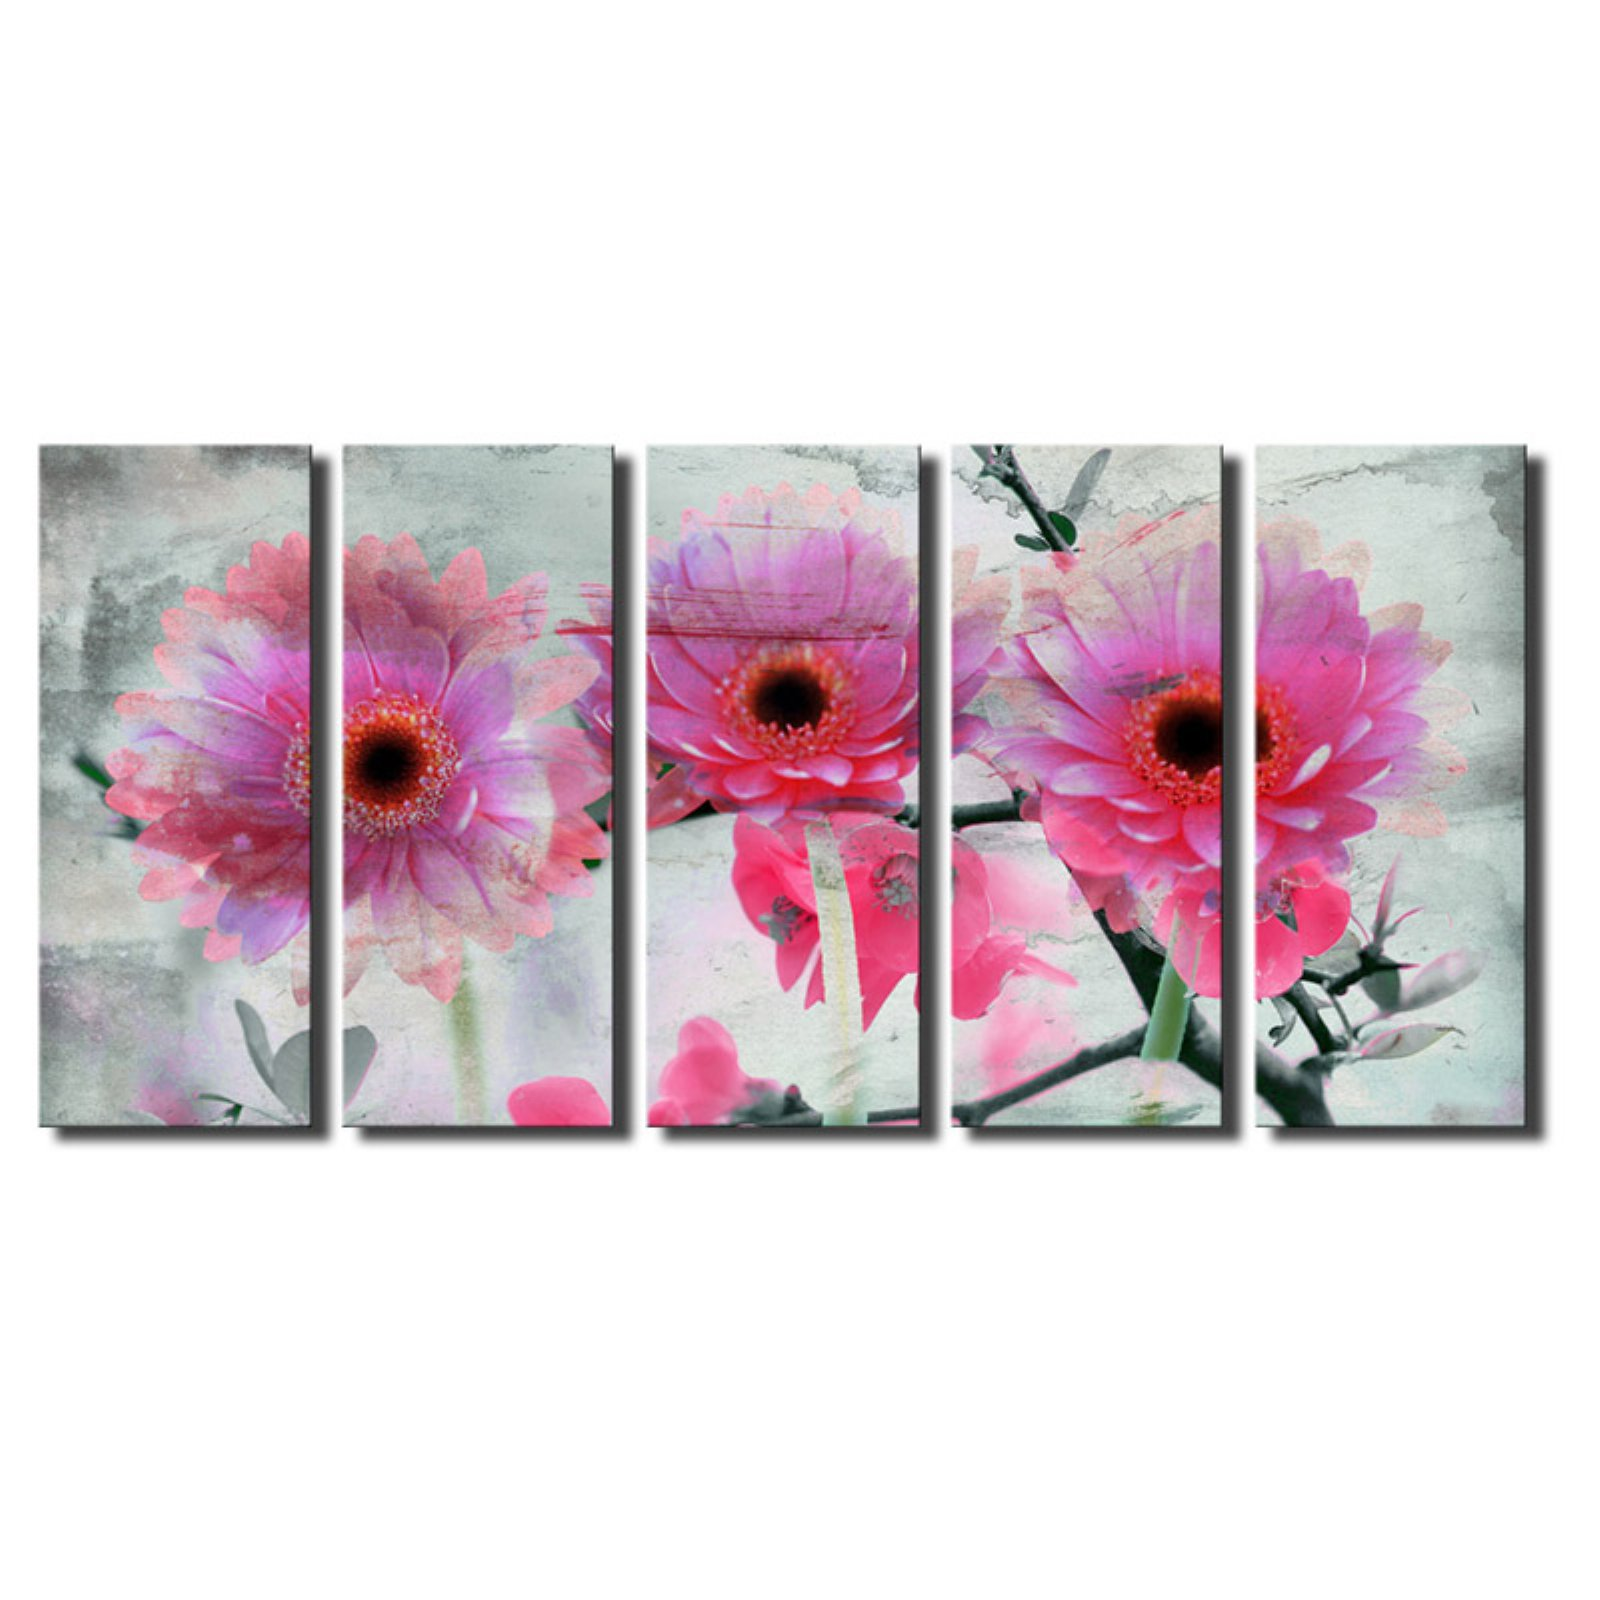 Ready2HangArt Painted Petals XLVI Canvas Wall Art - 5 pc. Set